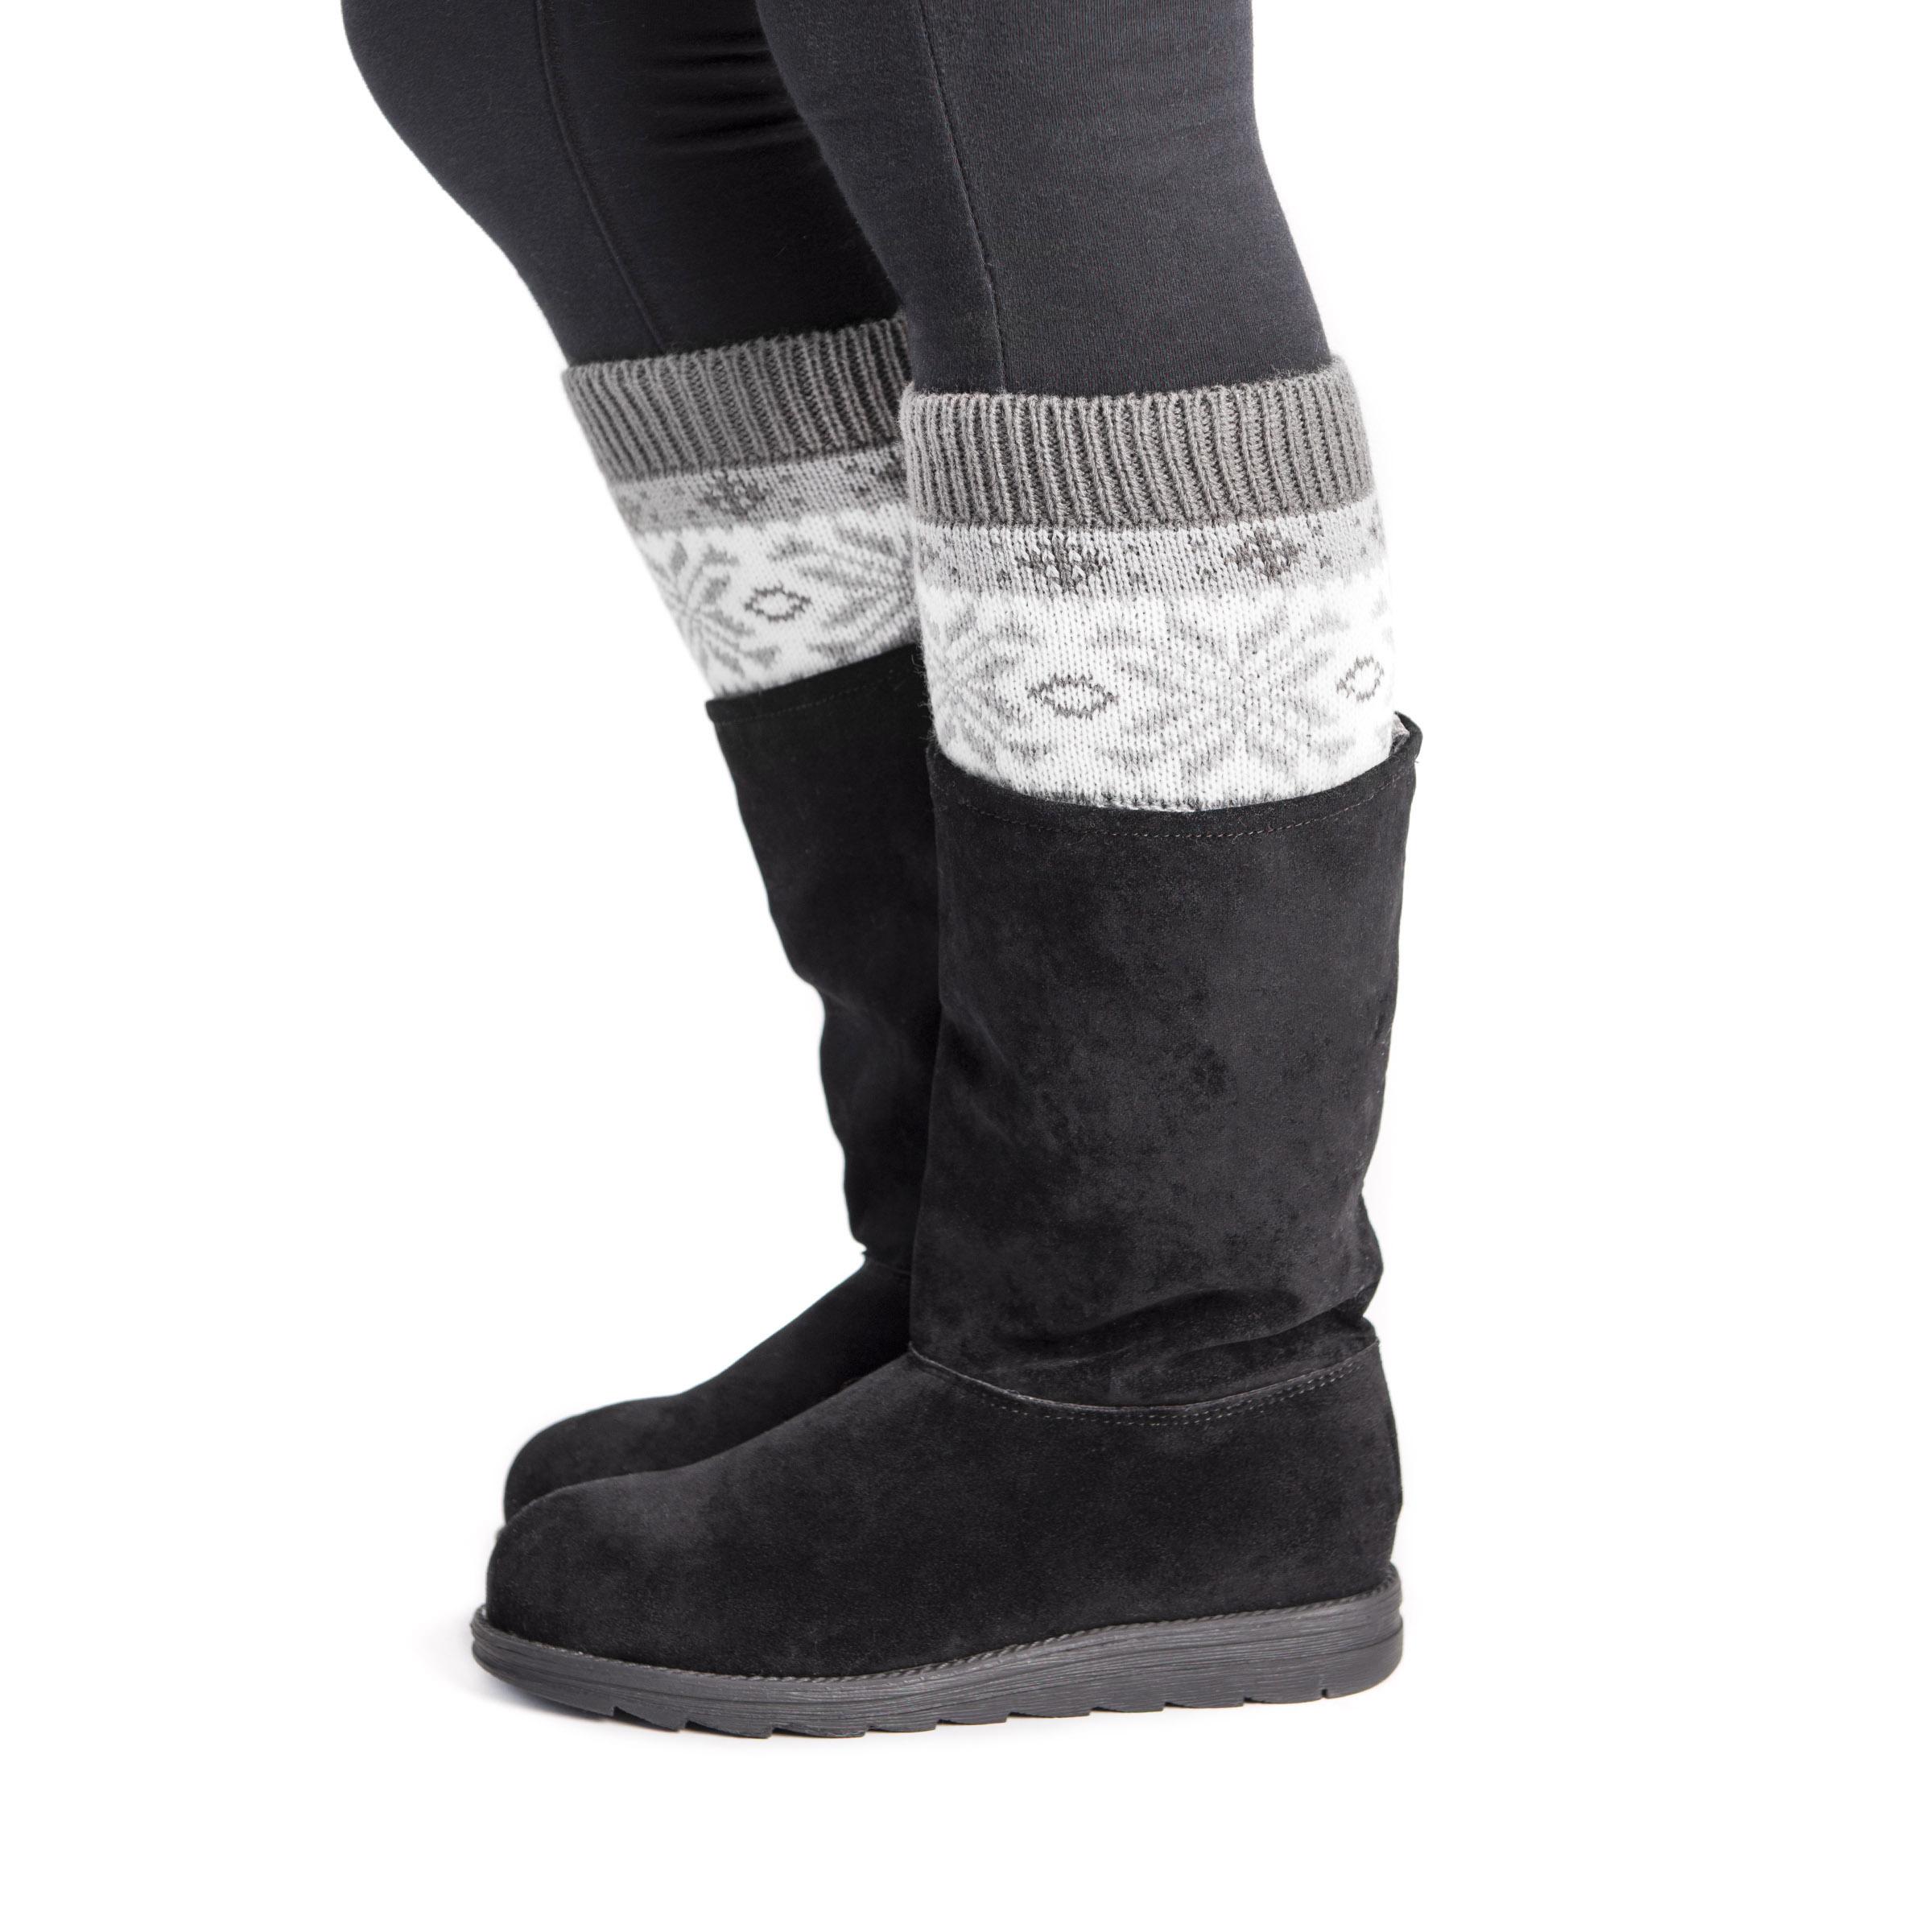 MUK LUKS 2-Pack Reversible Snowflake Boot Toppers (Women's) TZqhxIXrn8